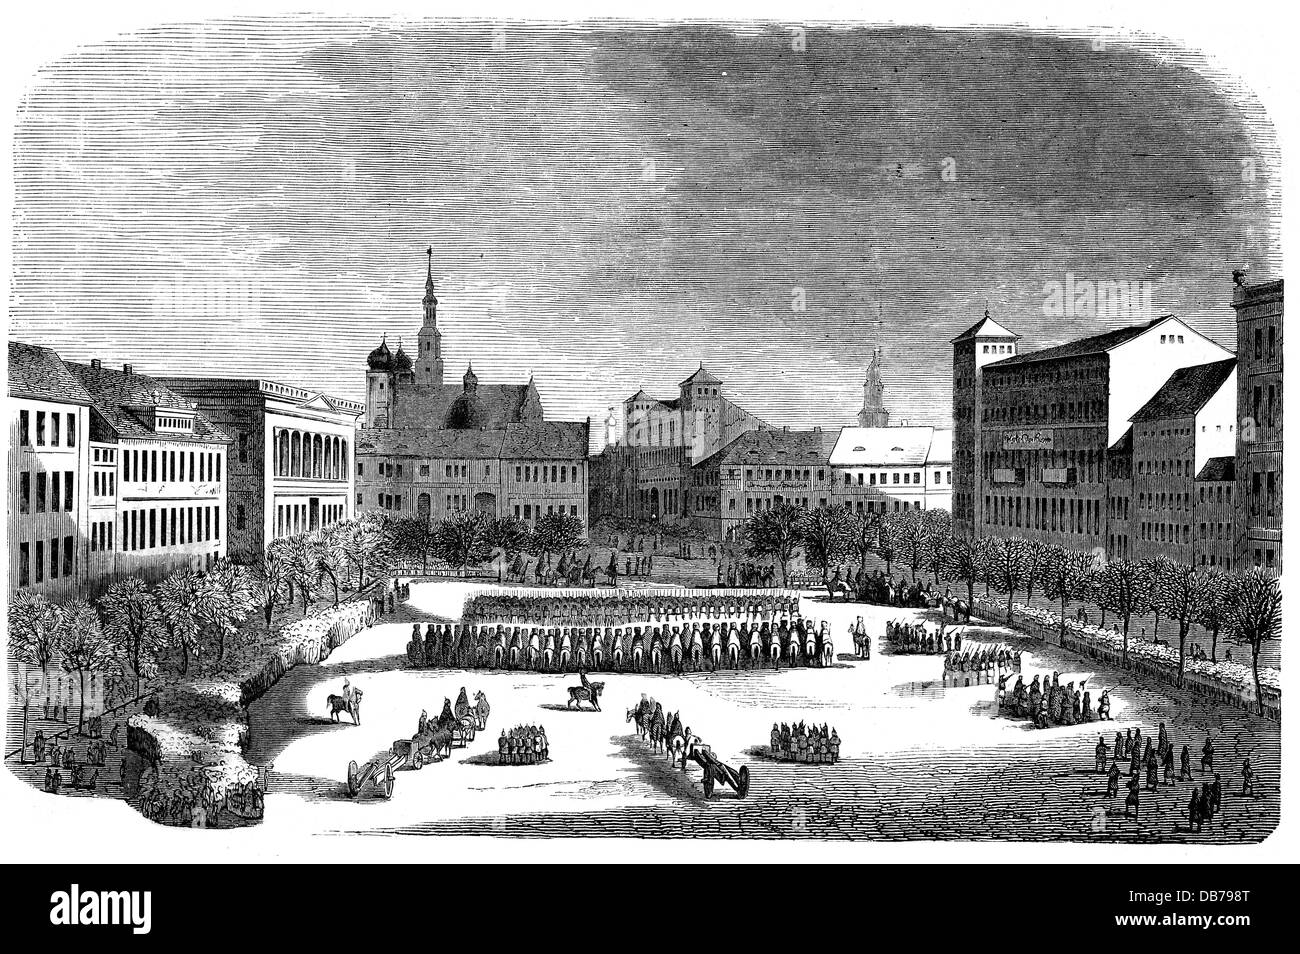 Greater Poland uprising 1846, seizure of the Wilhelmsplatz by Prussian troops, Poznan, 14.2.1846, Poland, Kingdom - Stock Image